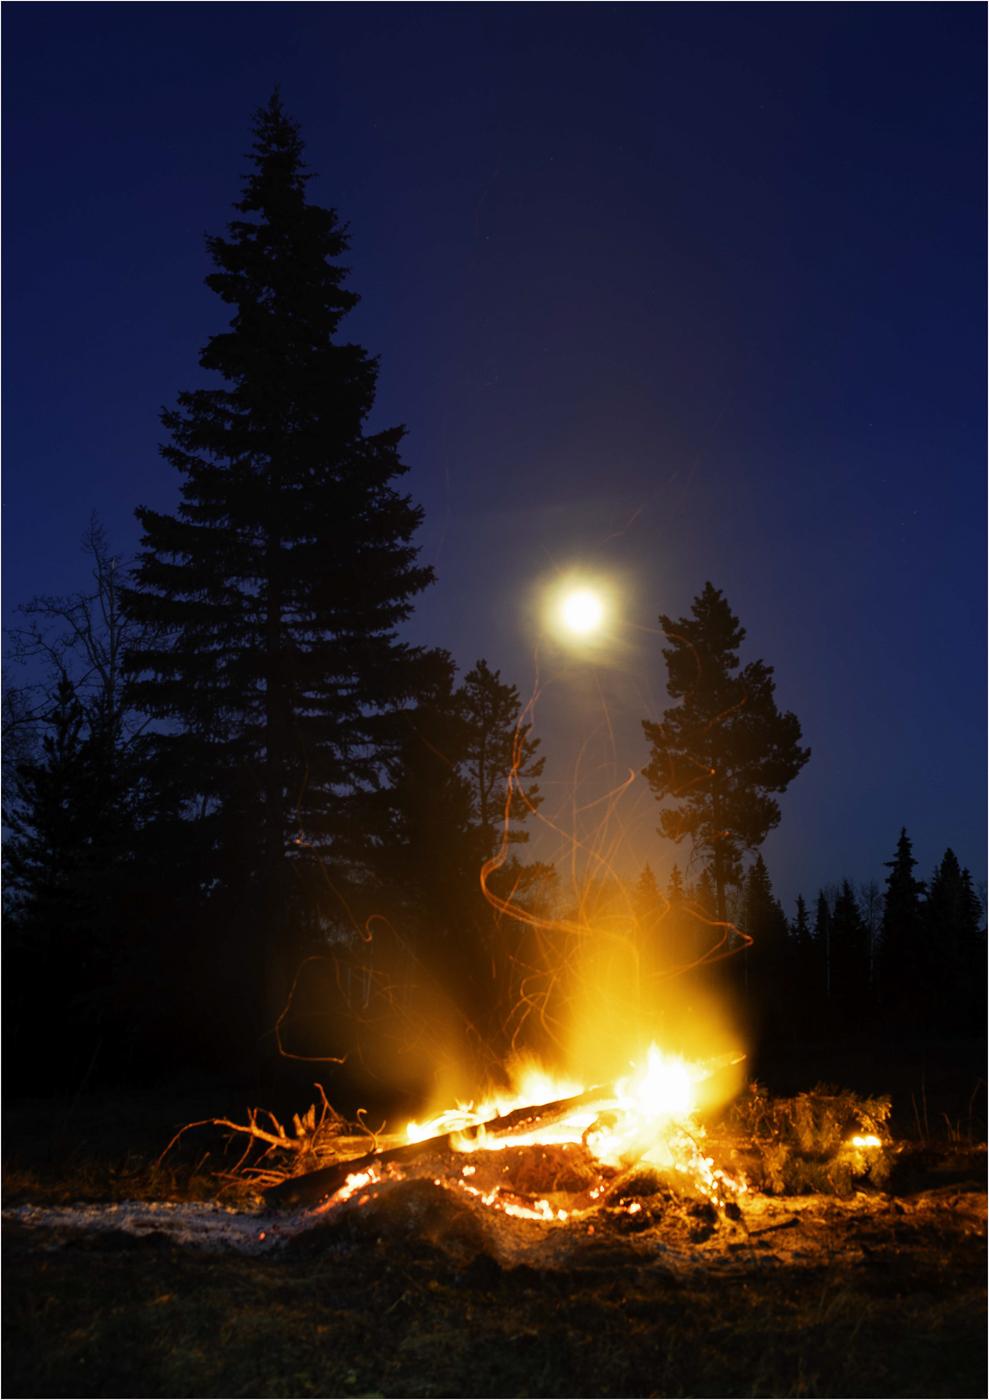 Moonlight and Firelight